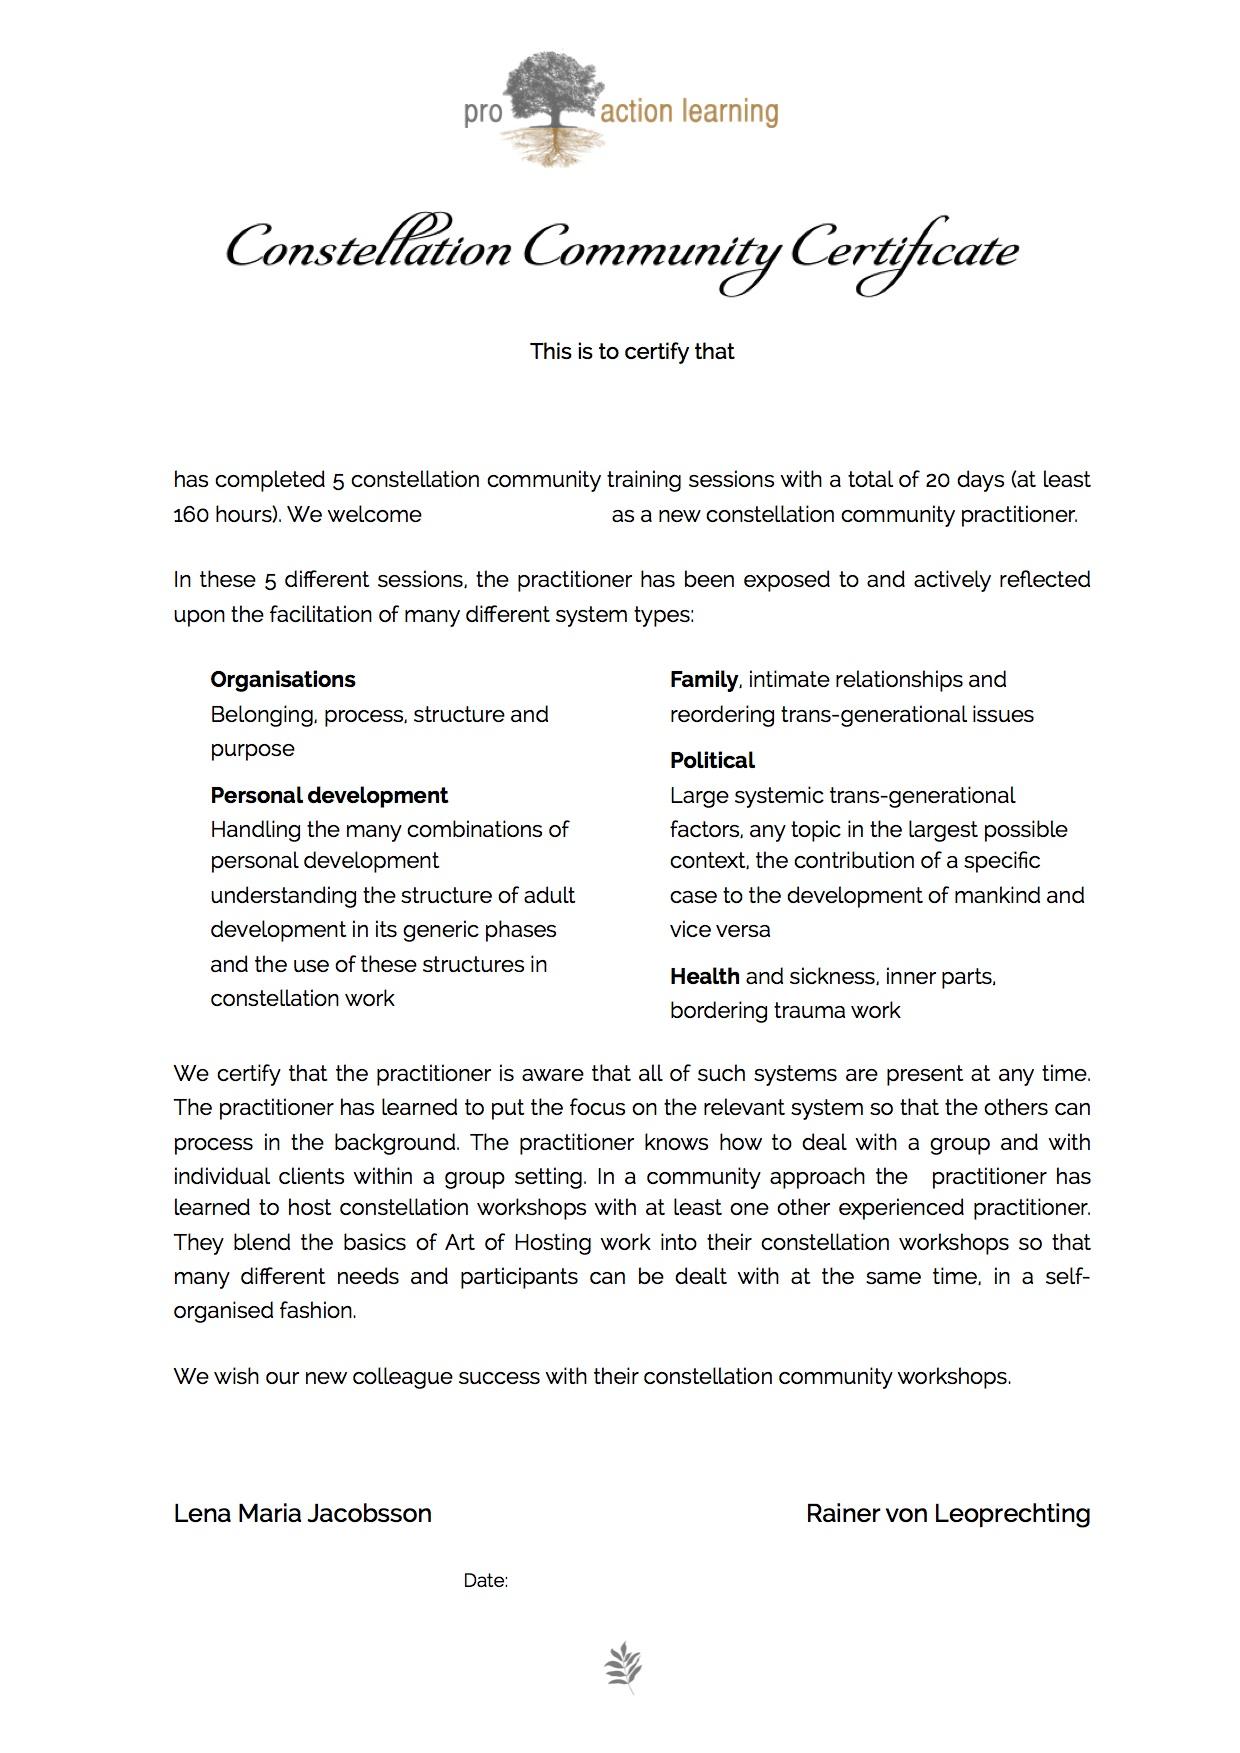 Constellation-Community-Certificate-1